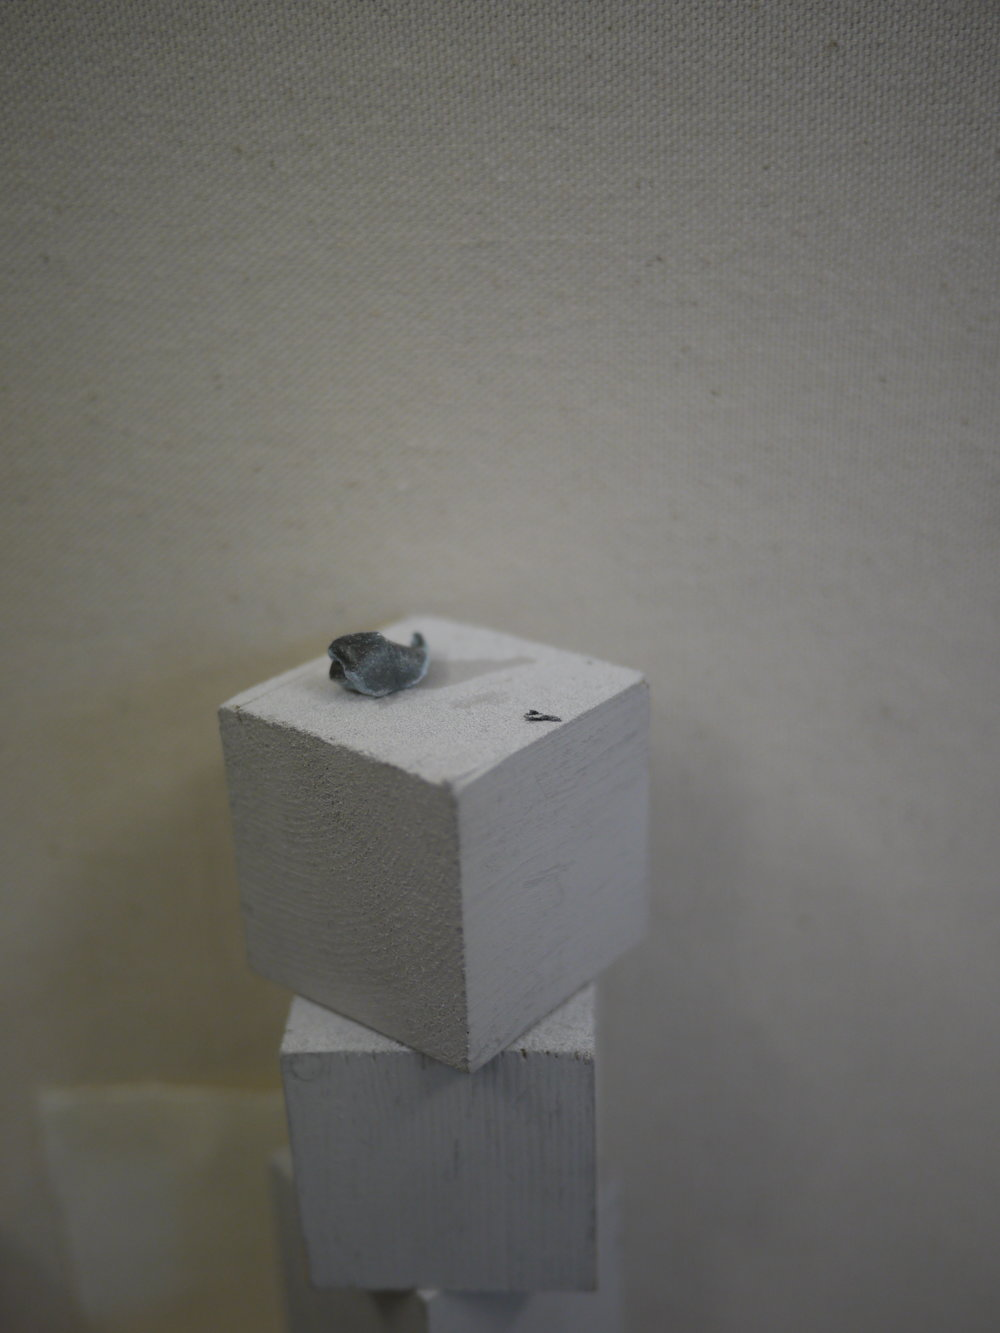 P1330609.JPG